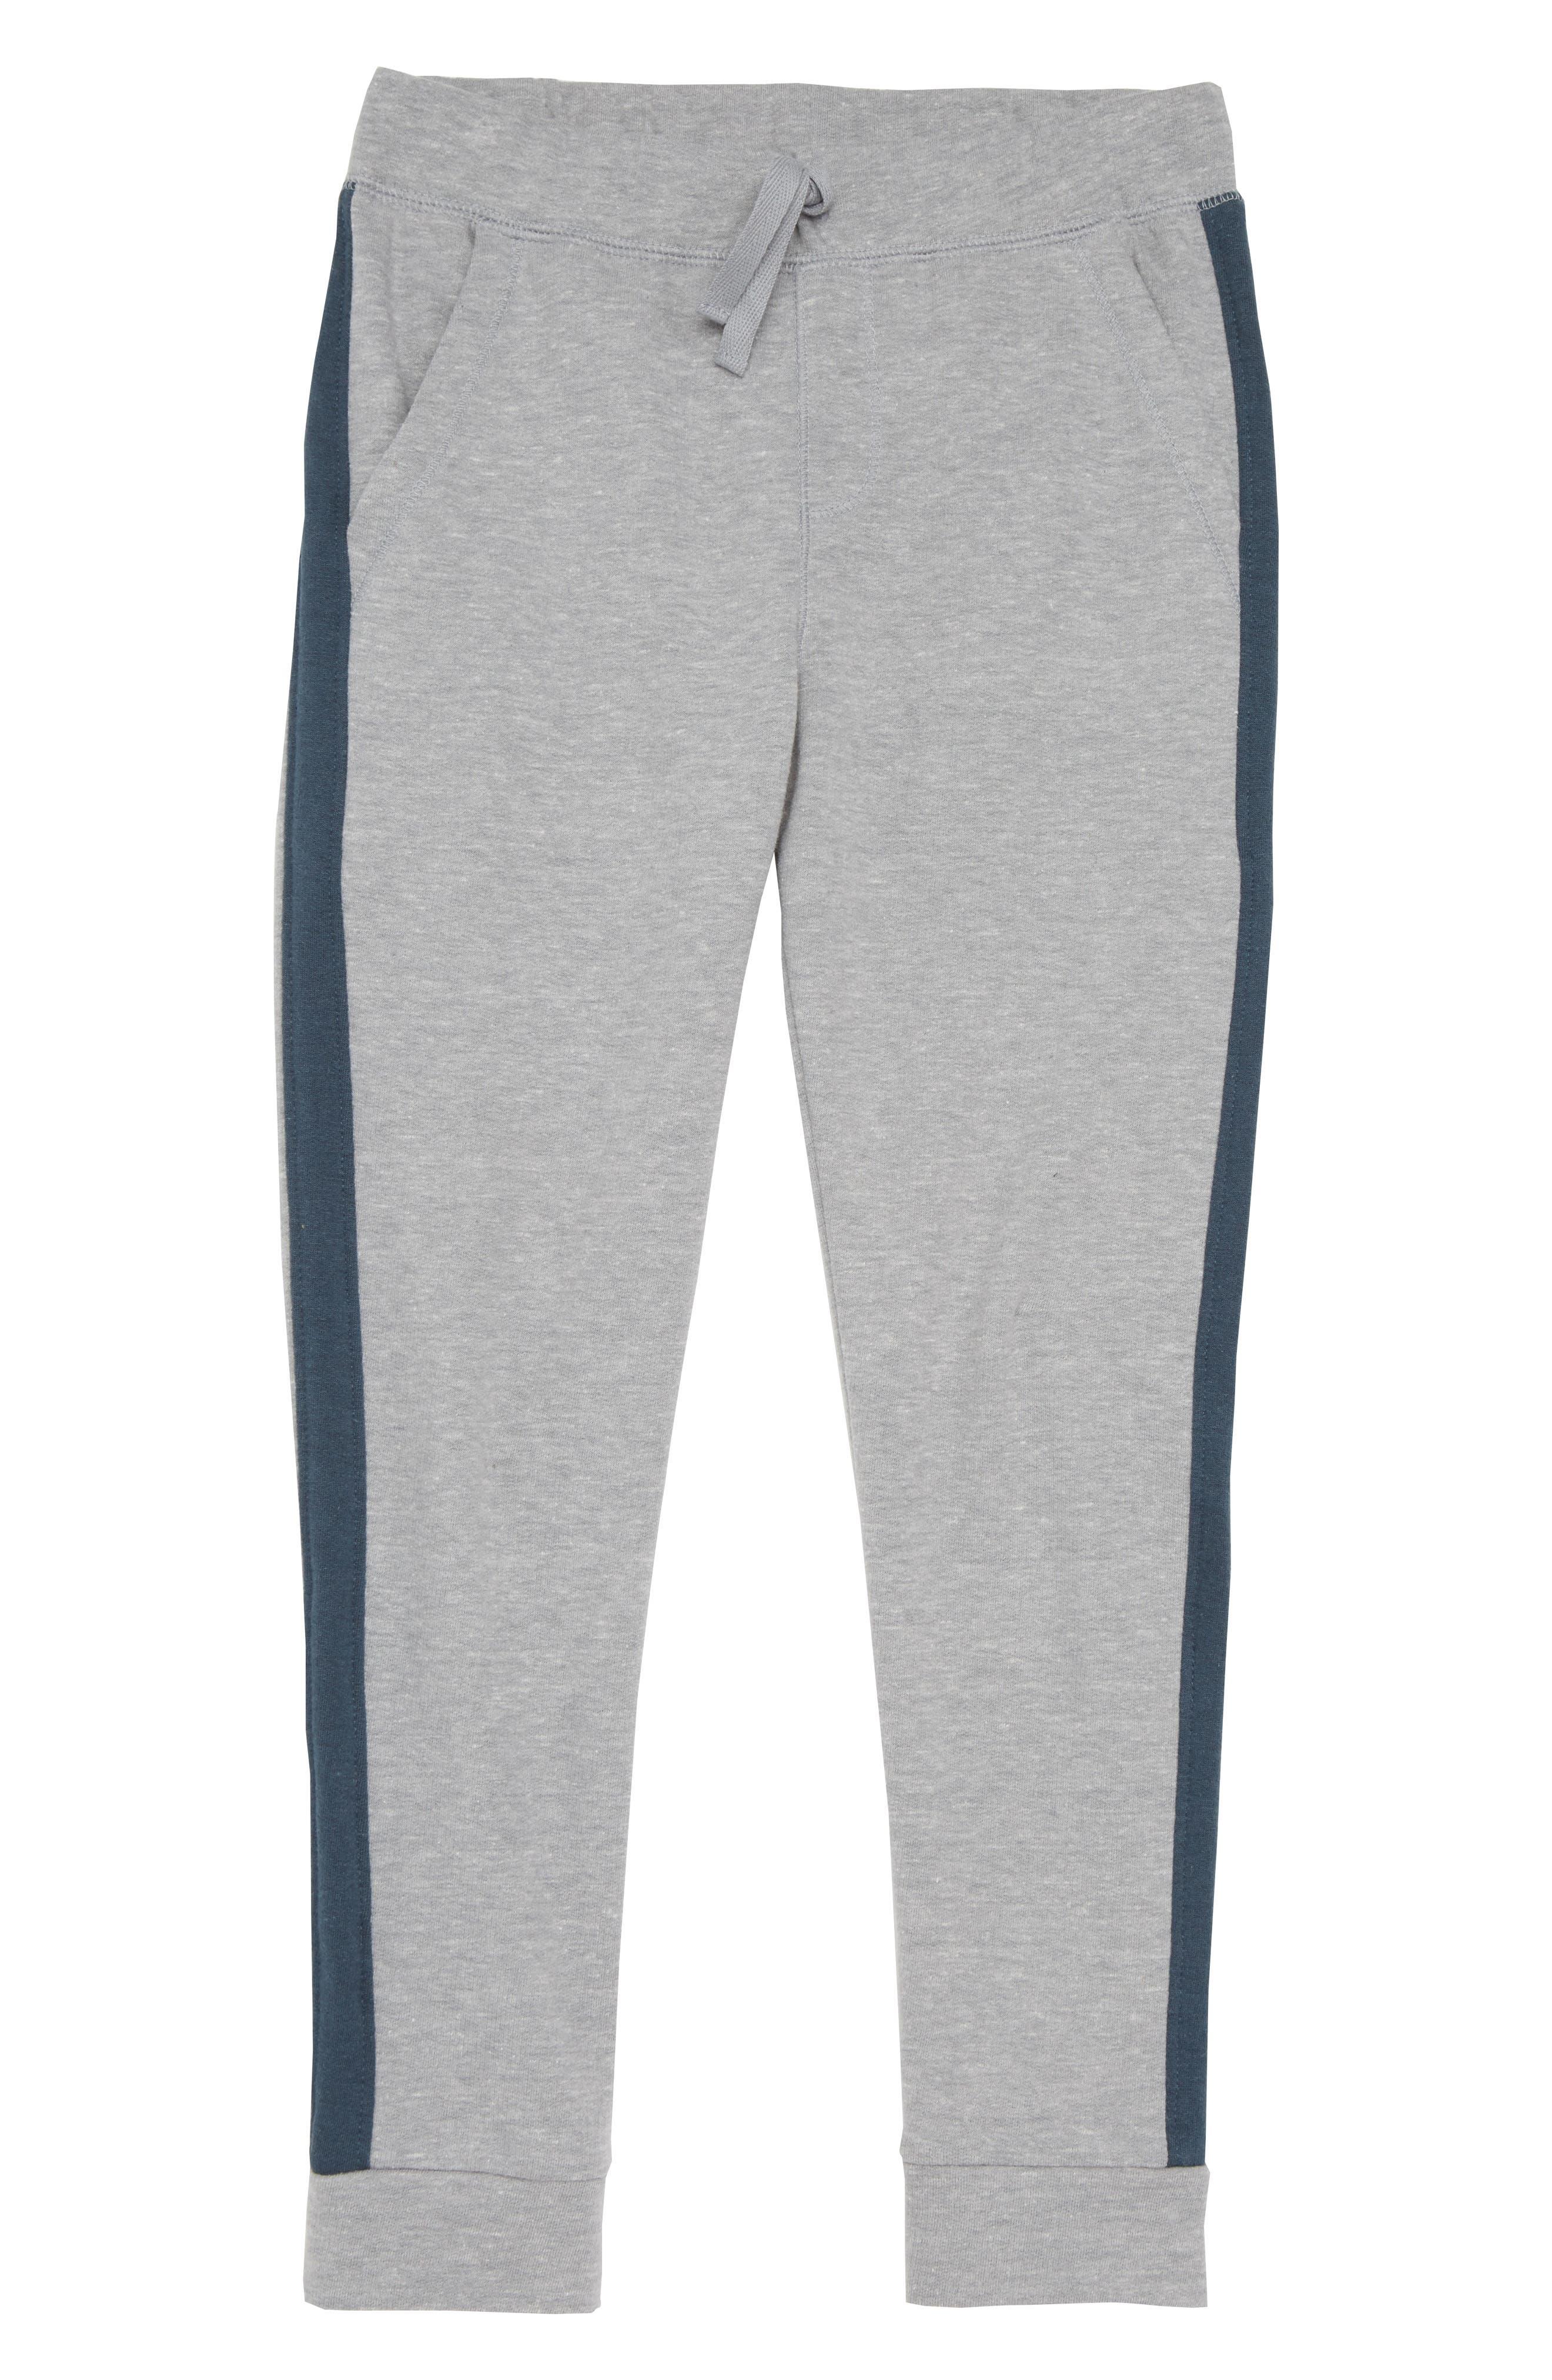 Varsity Fleece Jogger Pants,                             Main thumbnail 1, color,                             Grey Medium Heather- Navy